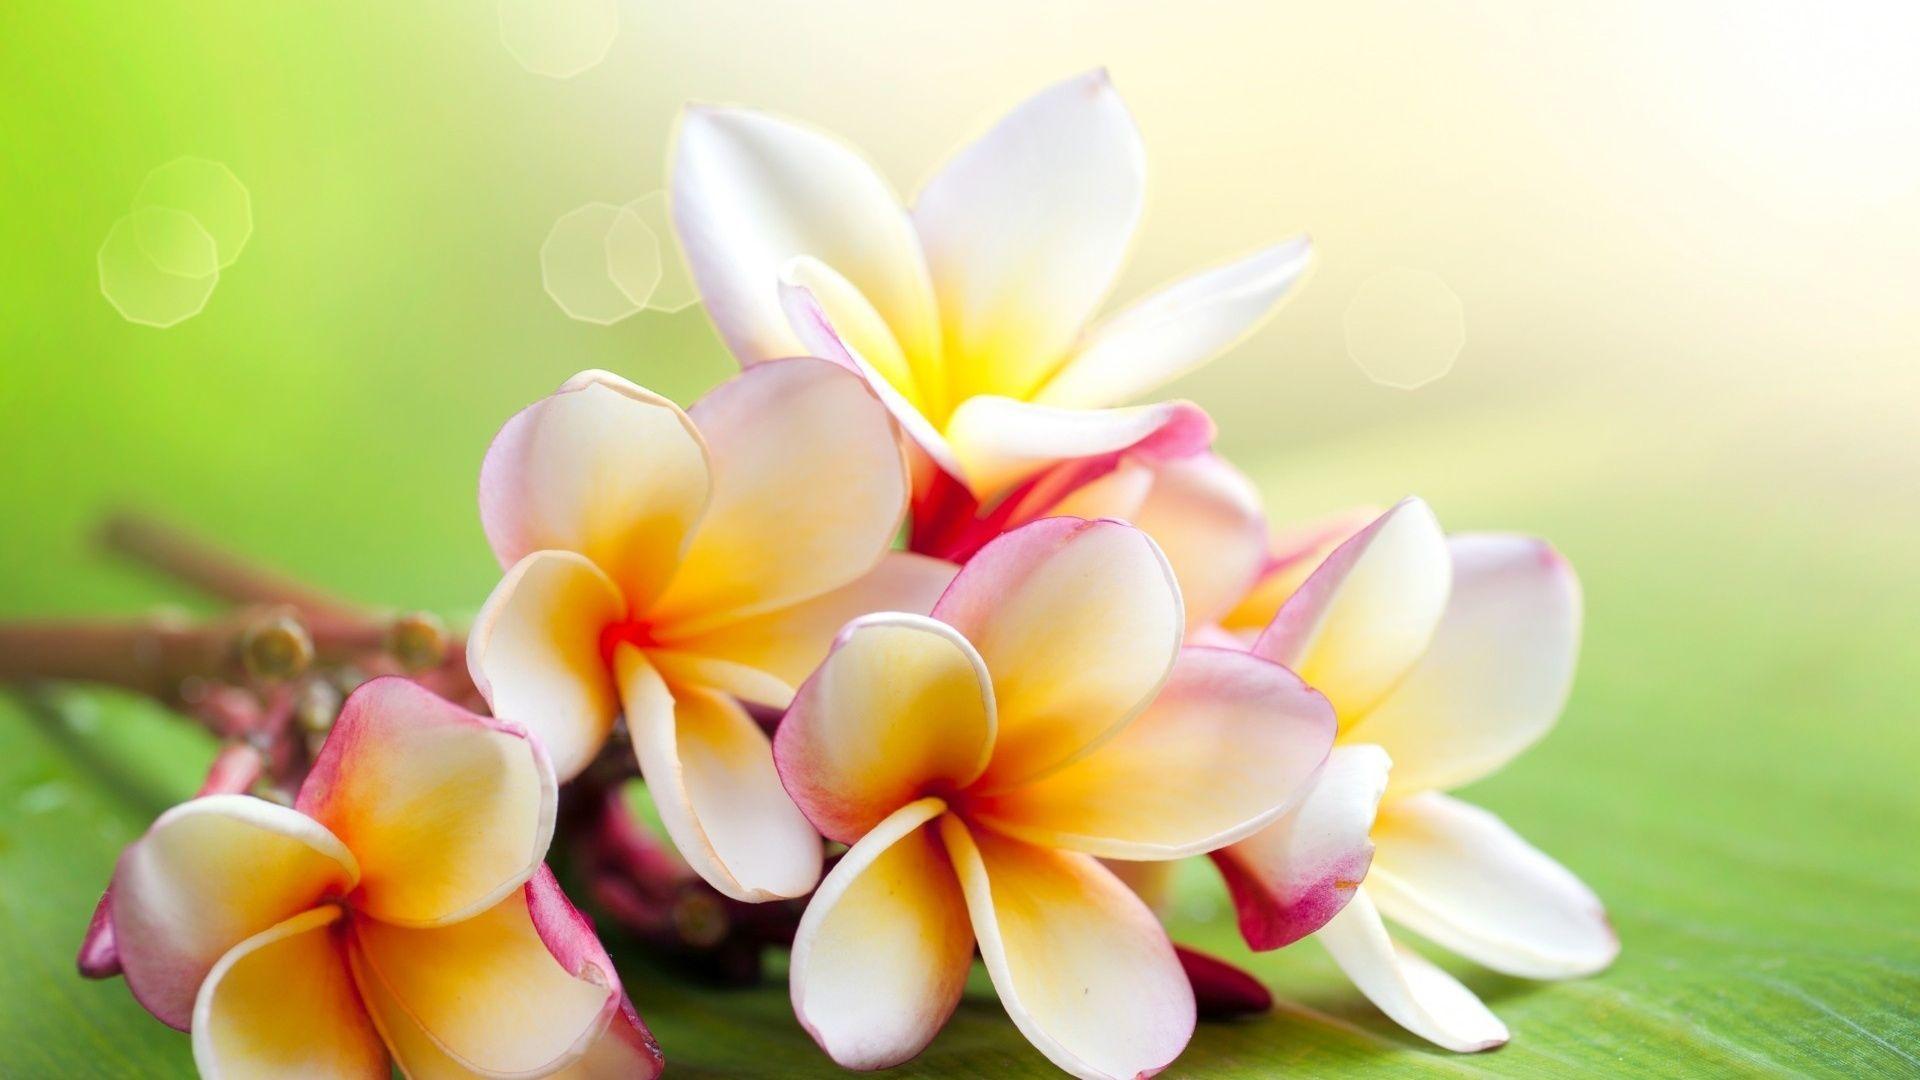 Jasmine Flower Wallpapers Hd Wallpaper Cave